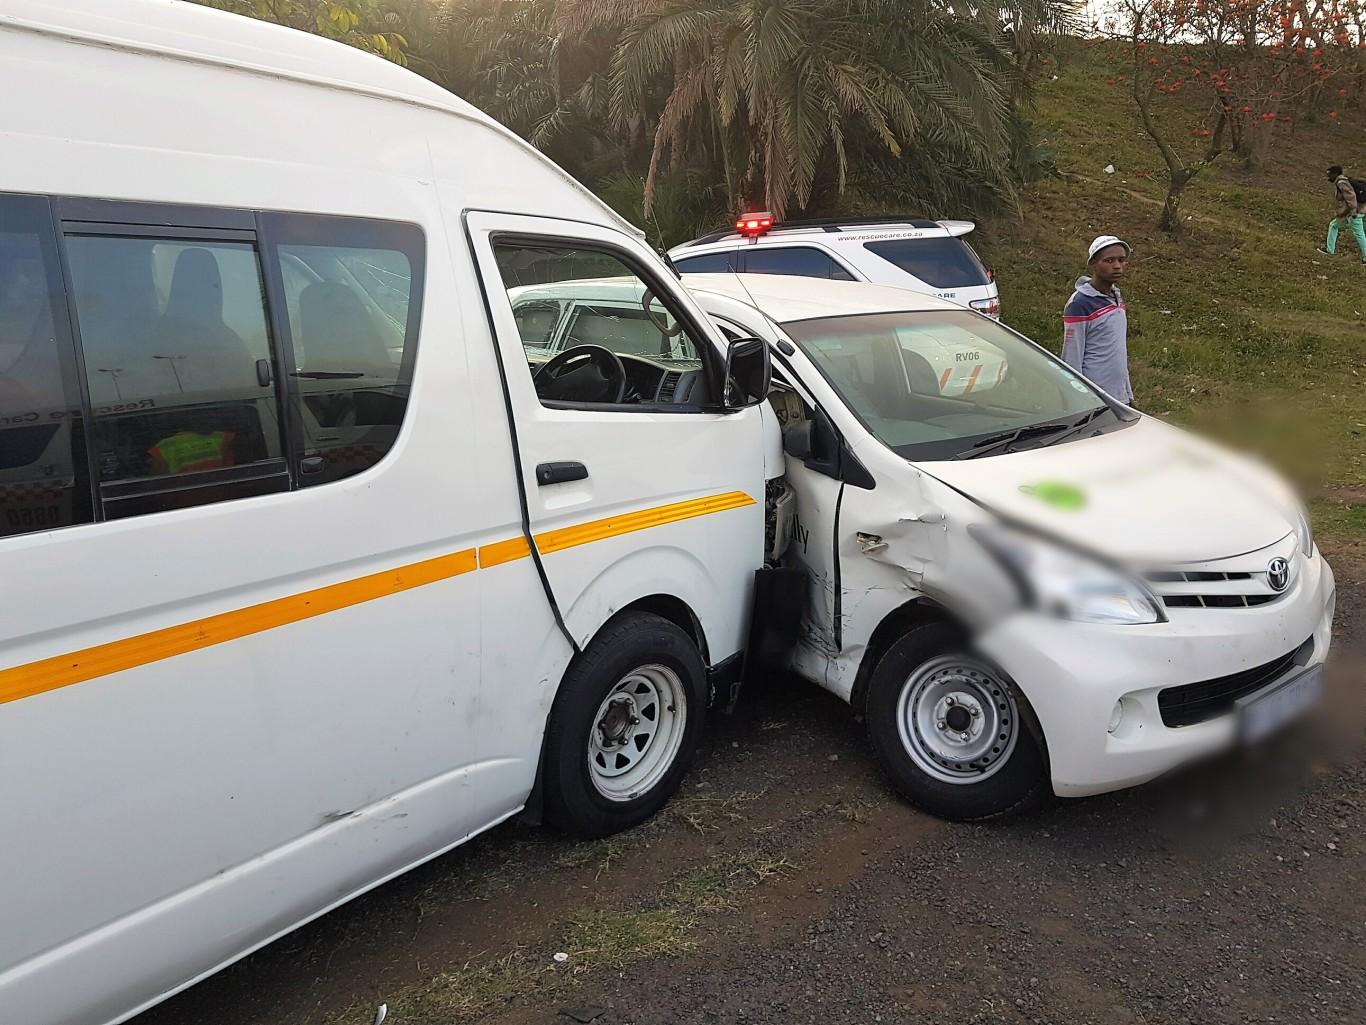 12 Injured in taxi crash on Sarnia Road near Rossburgh Bus Depot